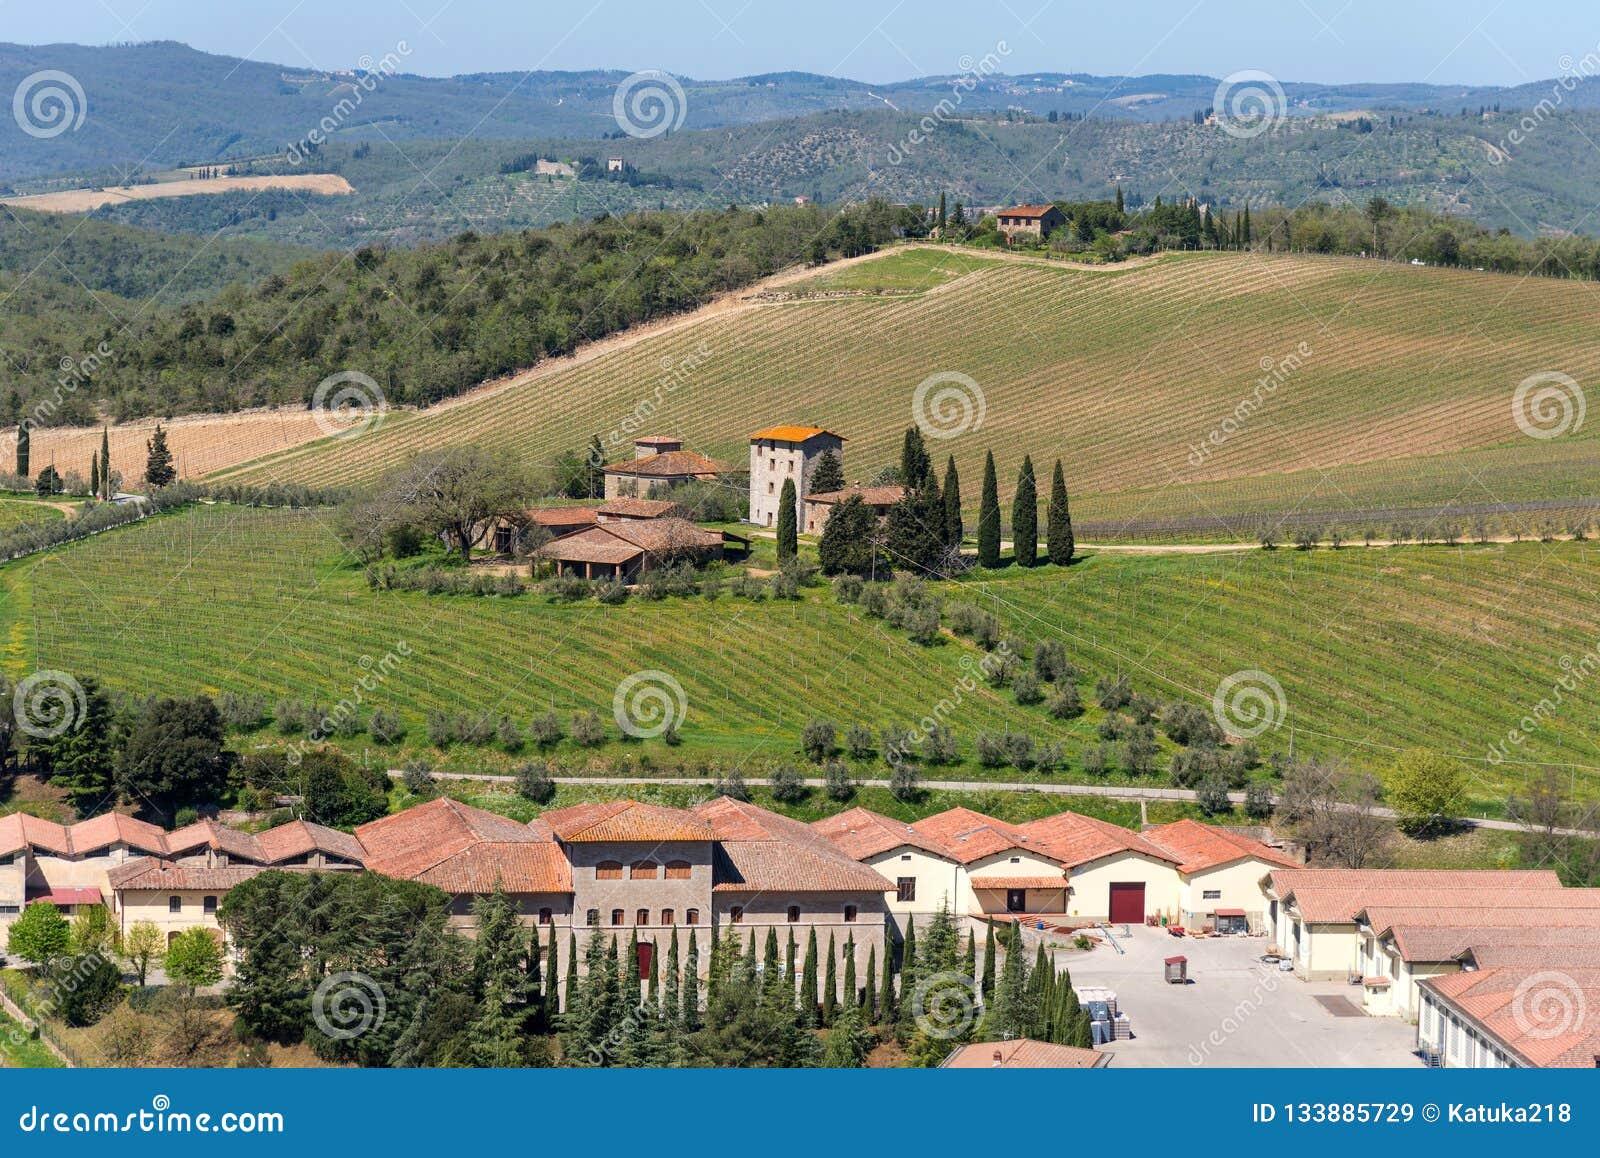 Chianti Region, Italy - April 21, 2018: Farmland rural landscape, cypress trees, vineyards and olive trees from Castello di Brolio